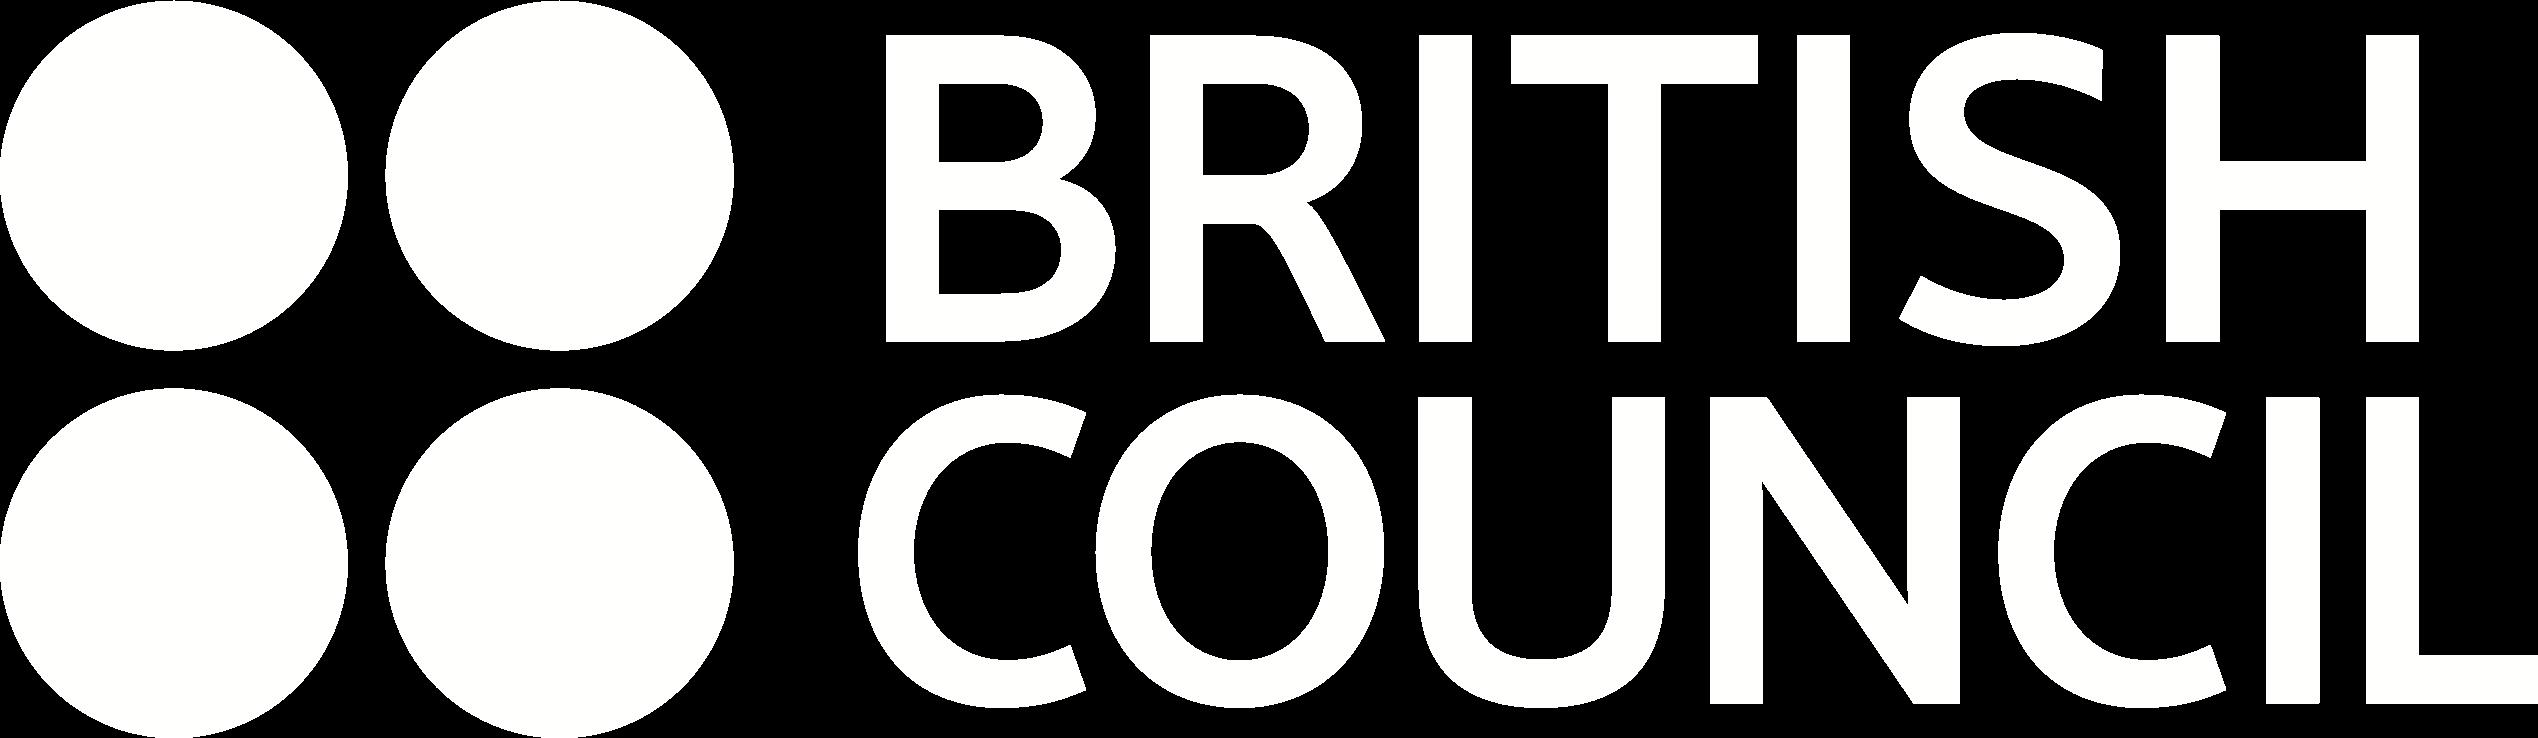 british council logo white